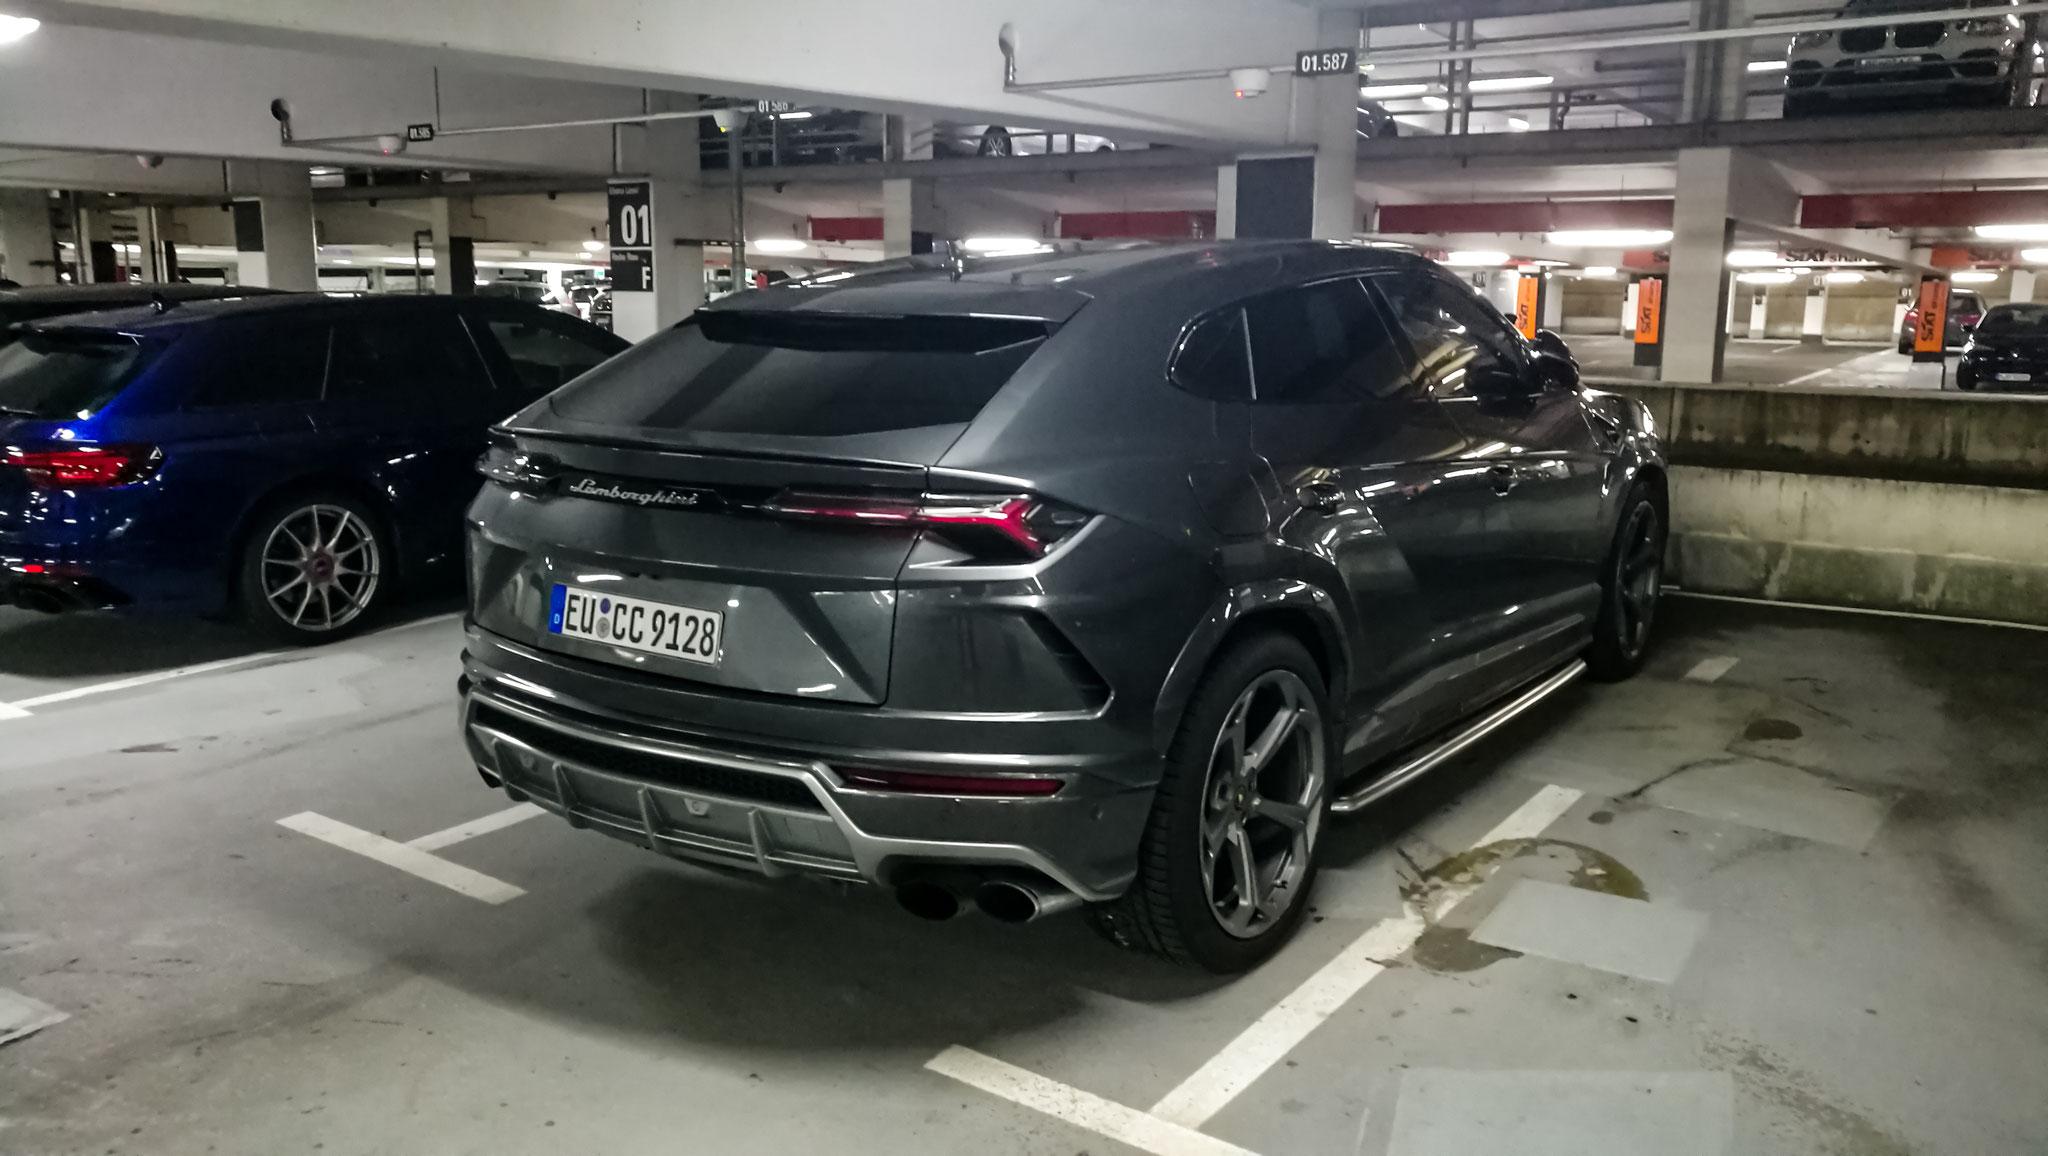 Lamborghini Urus - EU-CC-9128